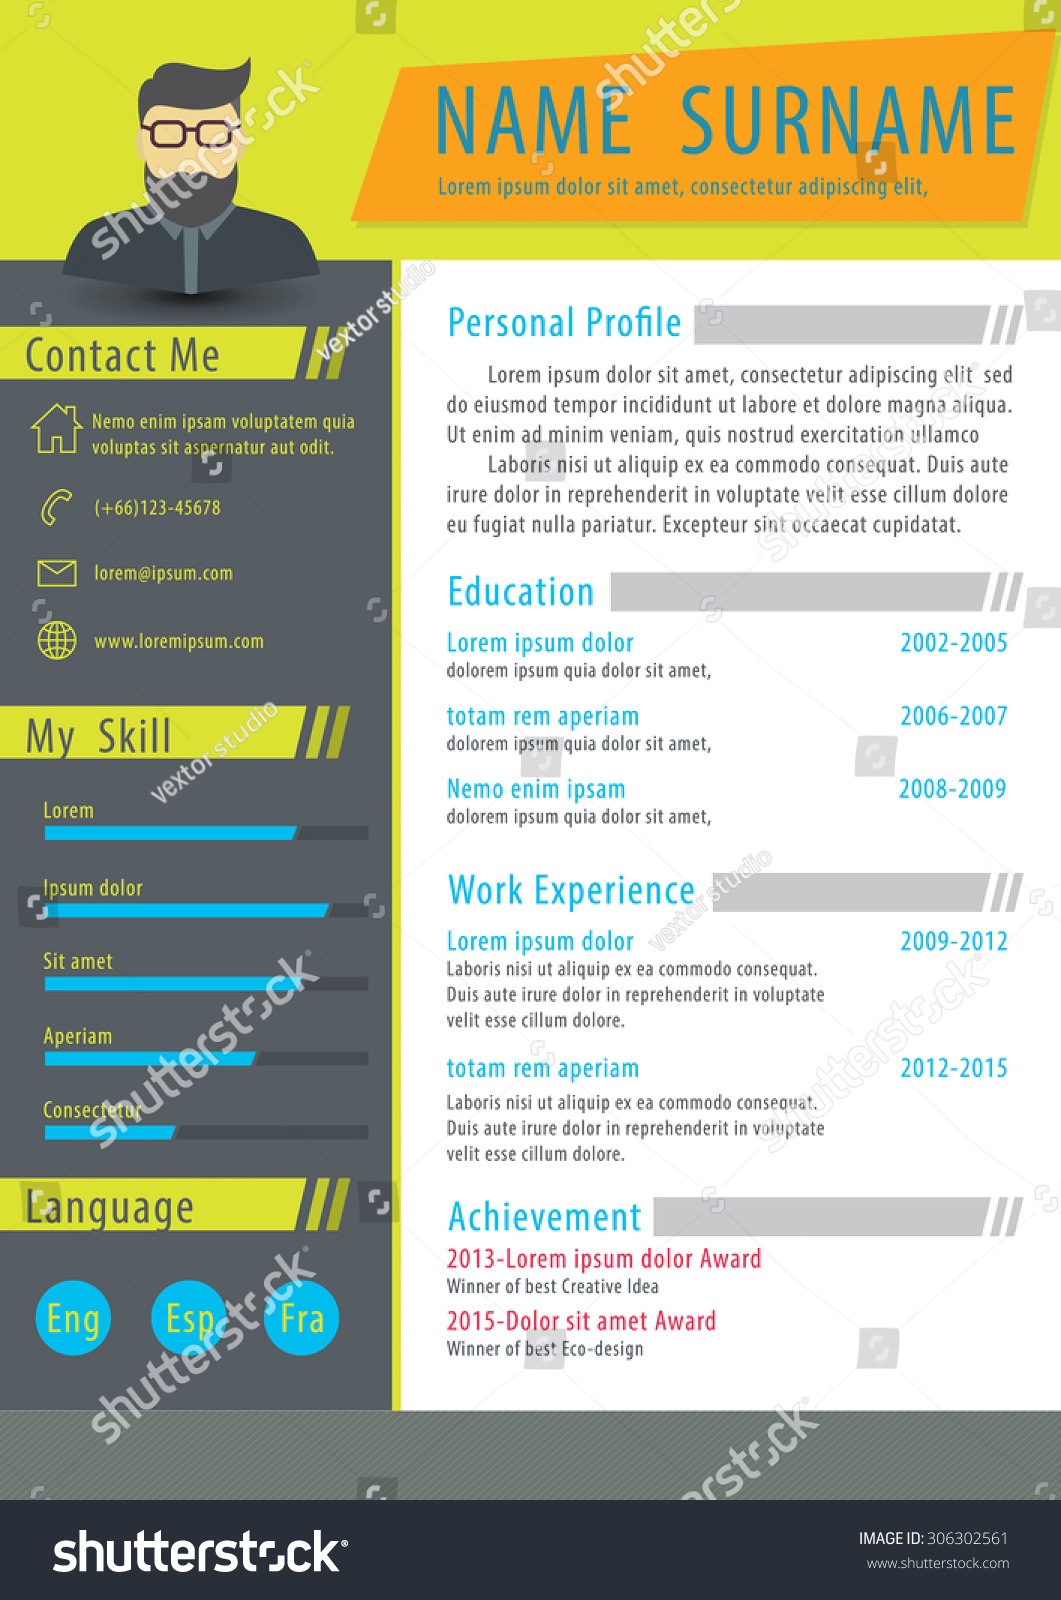 clean mini st resume templateflat design cvvector stock vector clean mini st resume template flat design of cv vector illustration